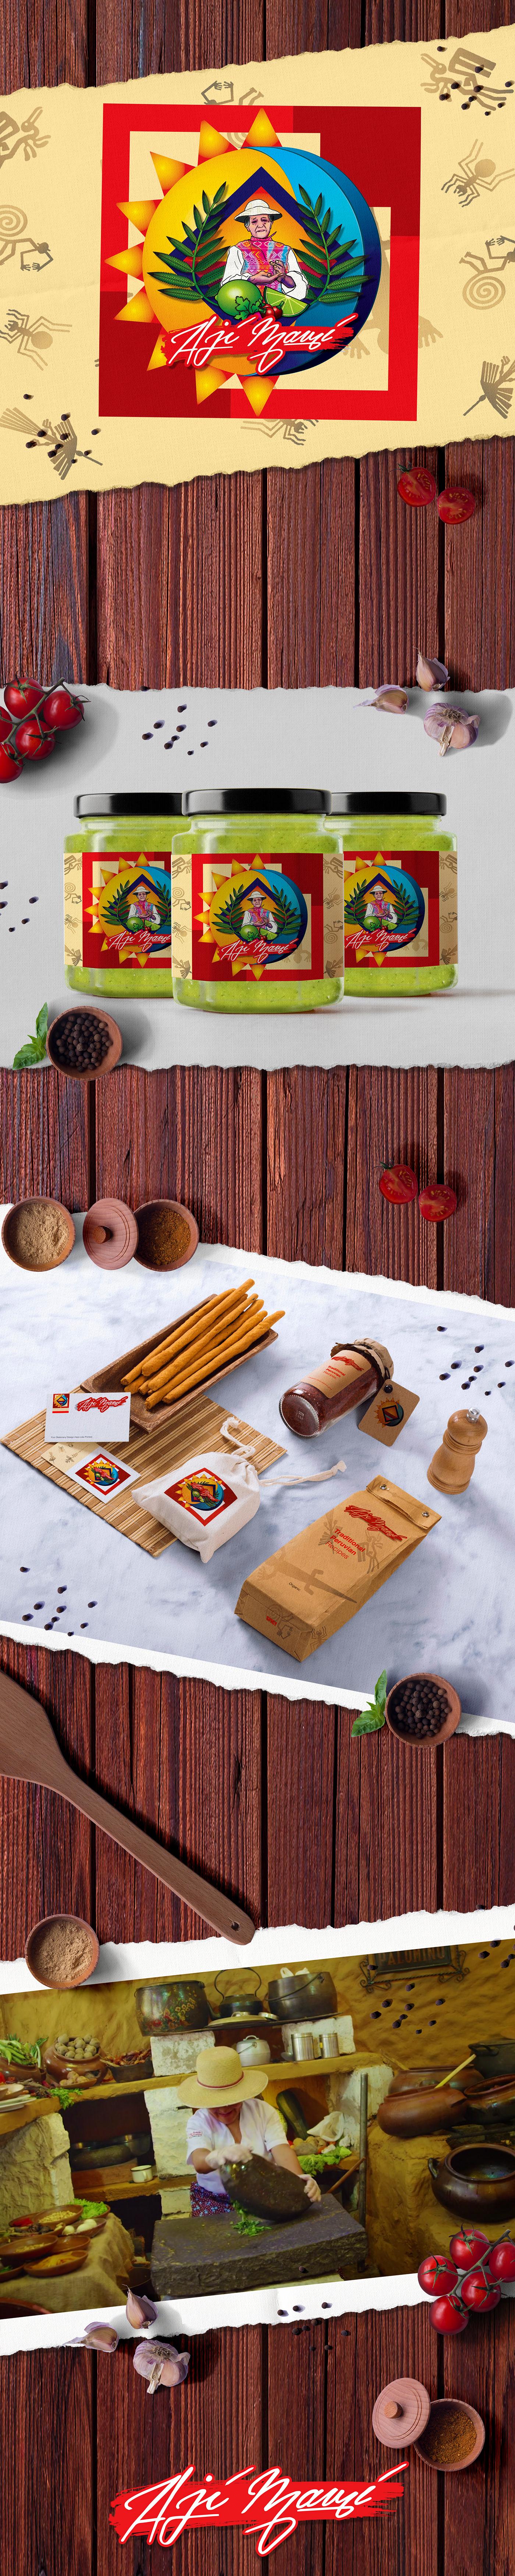 branding  hot sauce Packaging product design